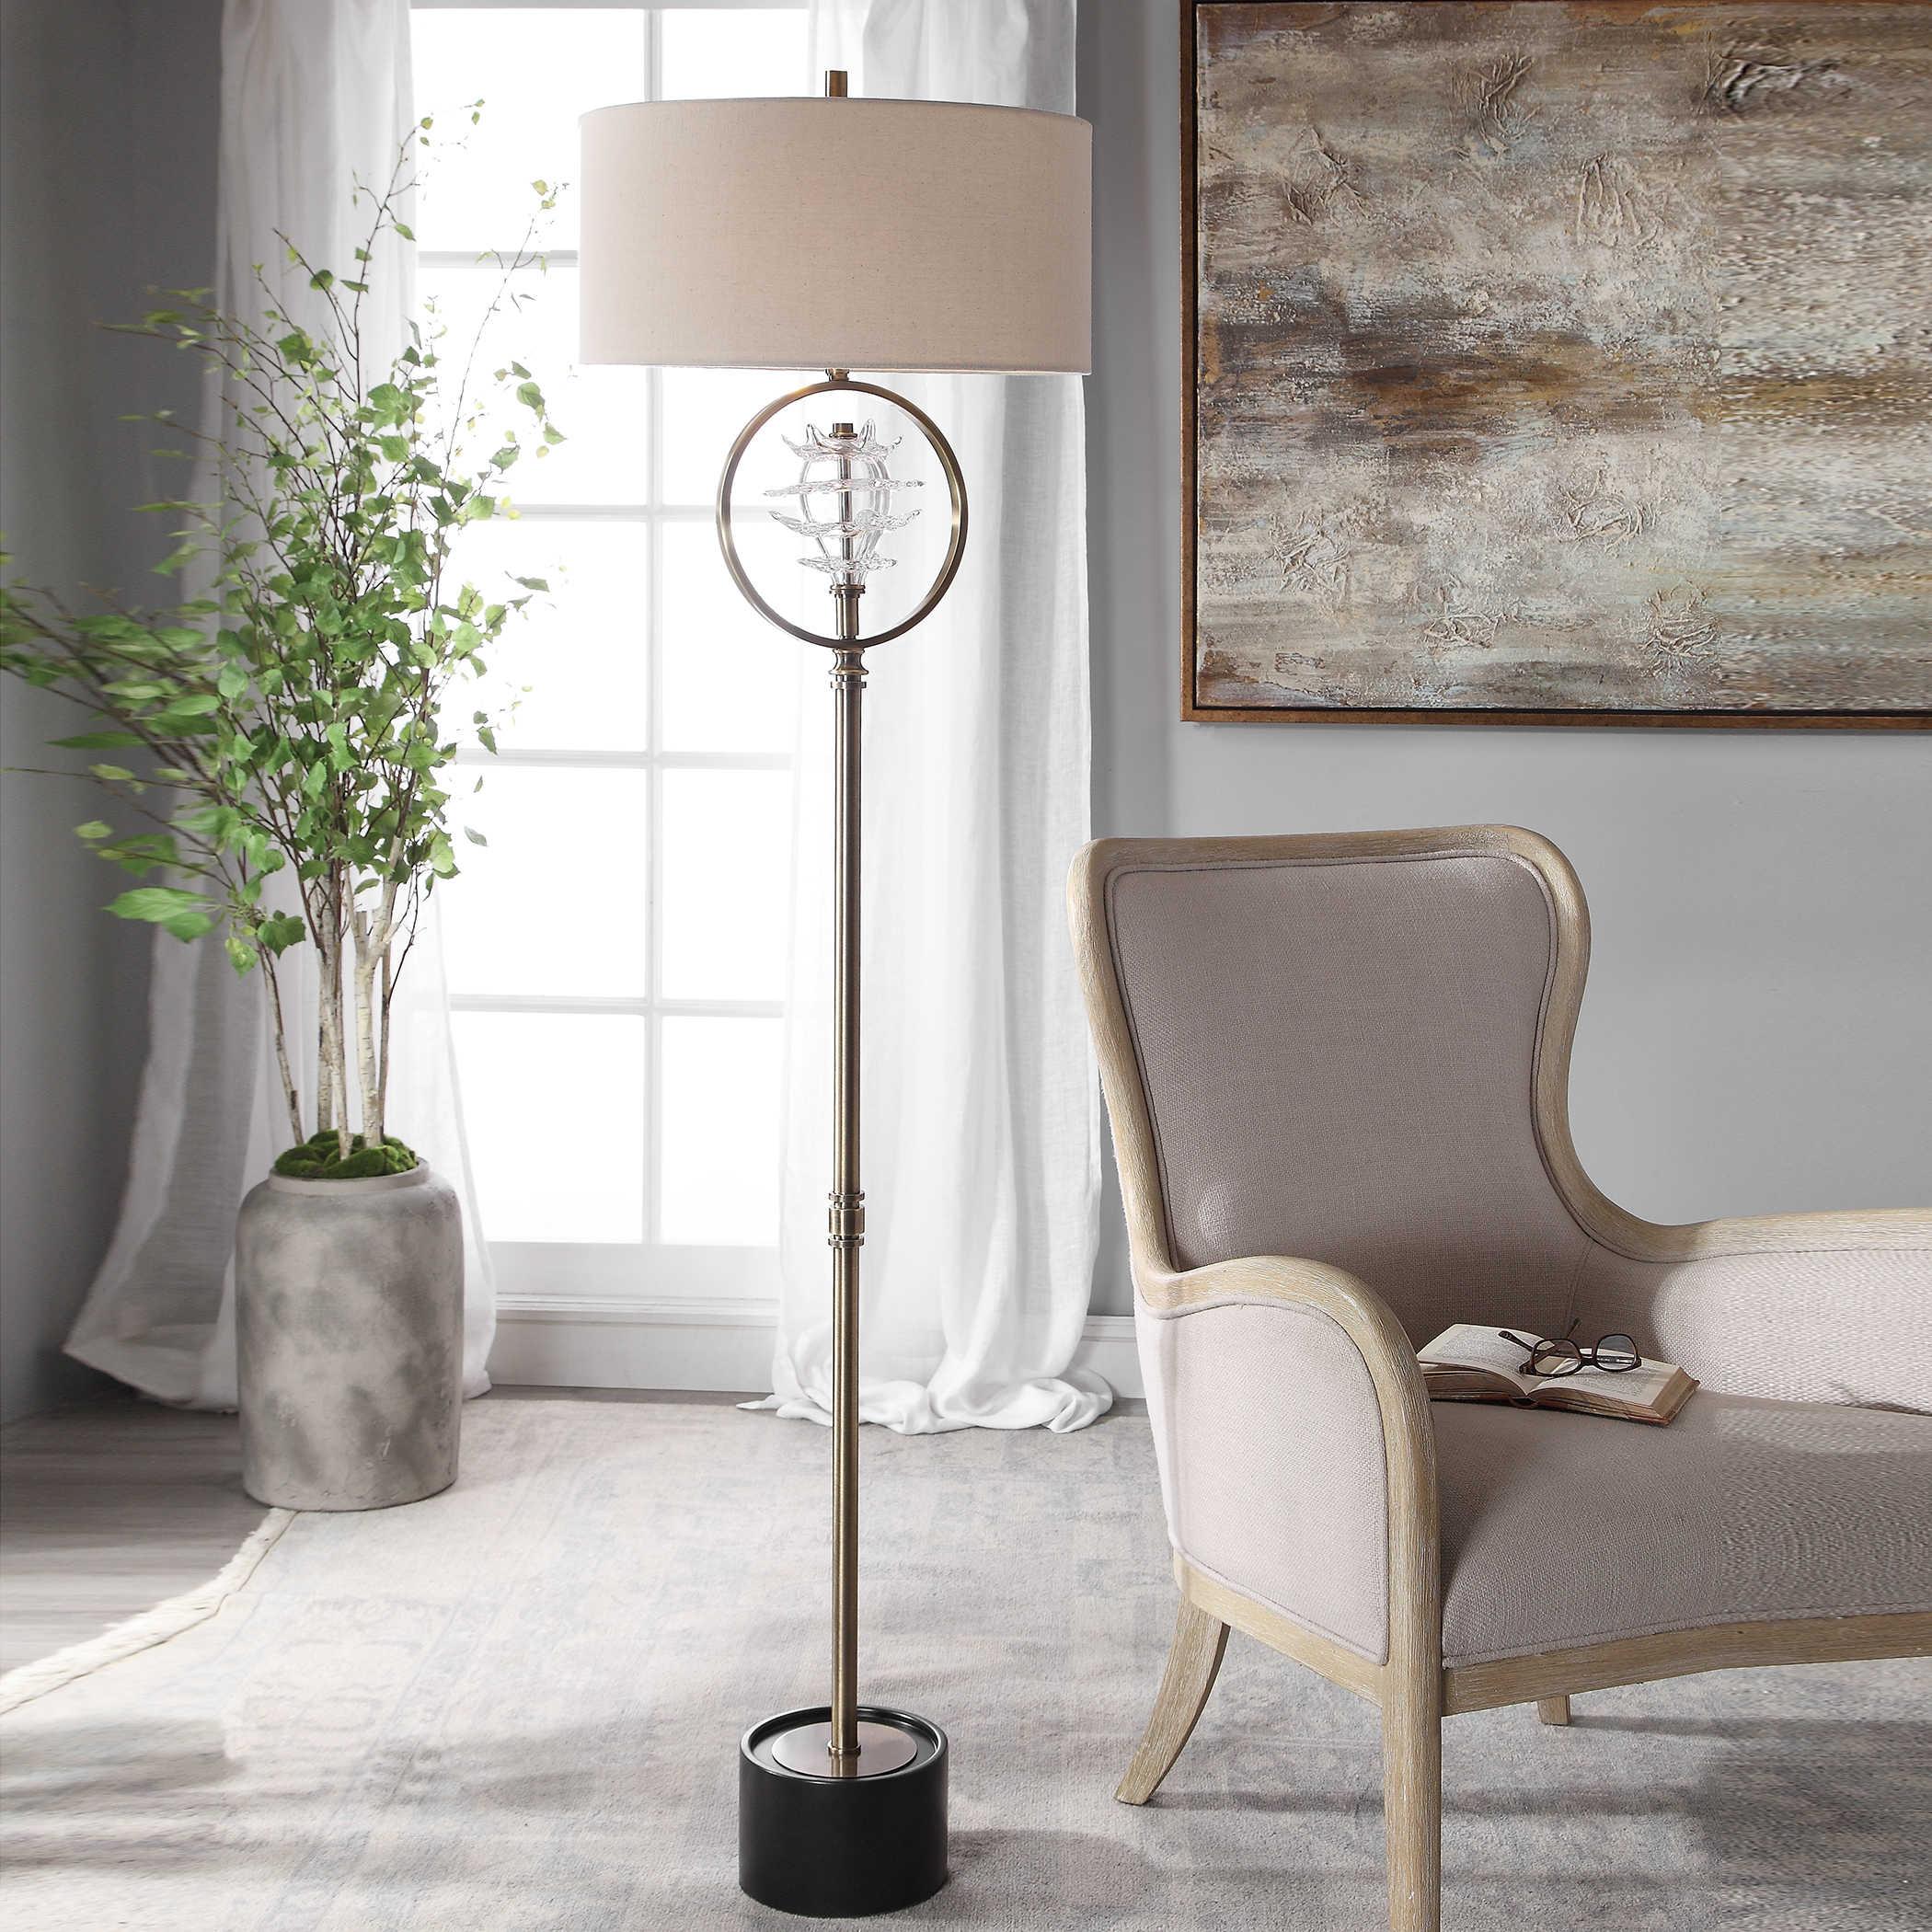 Phenomenal Wholesale Uttermost Accent Furniture Mirrors Wall Decor Theyellowbook Wood Chair Design Ideas Theyellowbookinfo